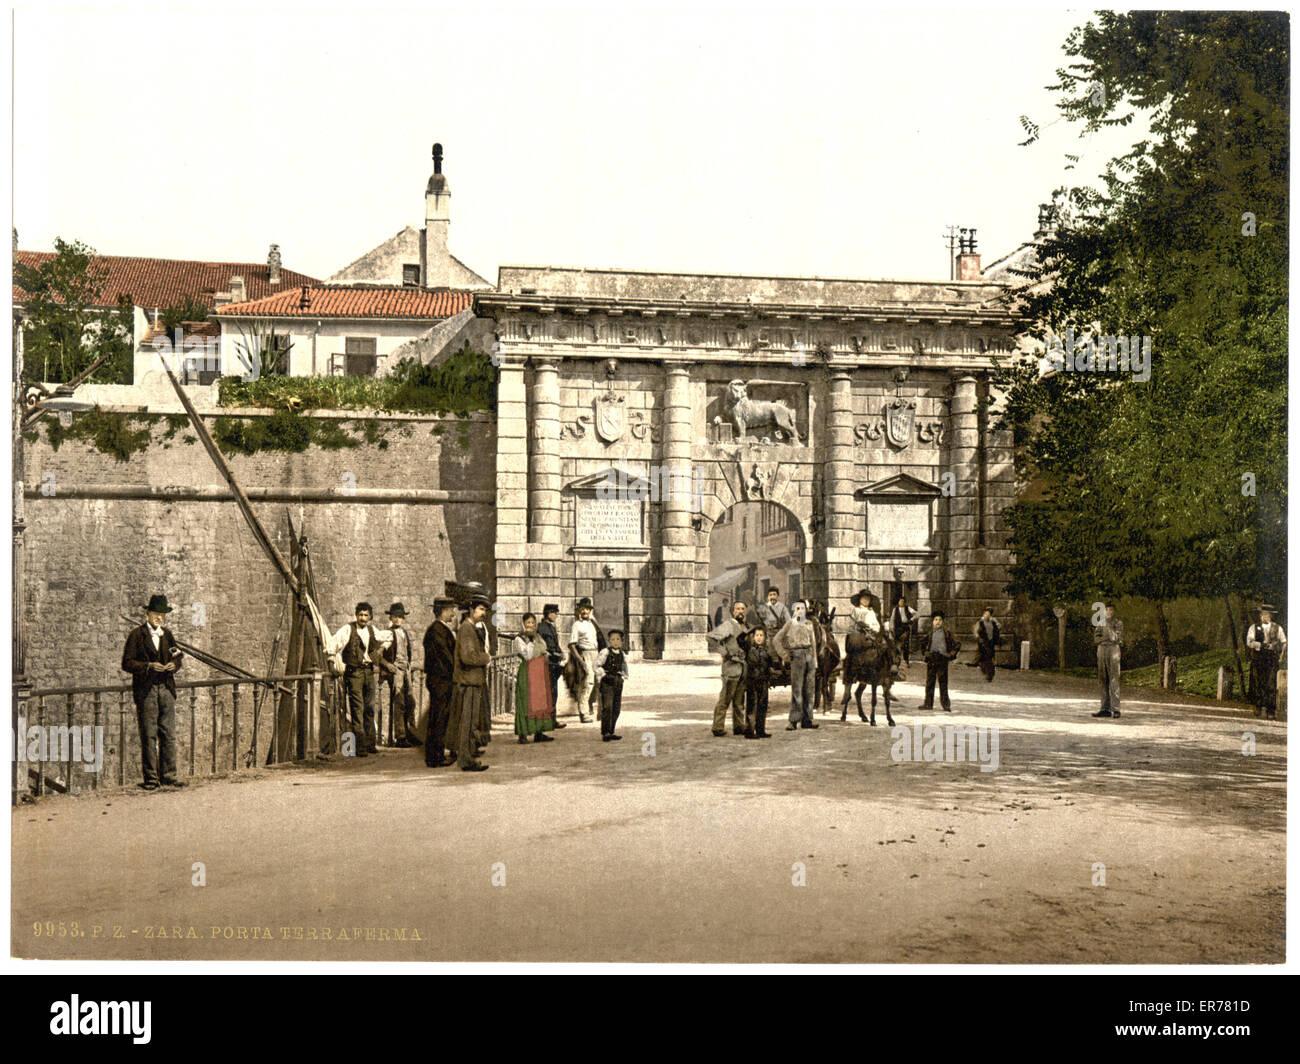 Zara, Arch Terra Firma (i.e., Porta di Terraferma), Dalmatia, Austro-Hungary. Date between ca. 1890 and ca. 1900. - Stock Image